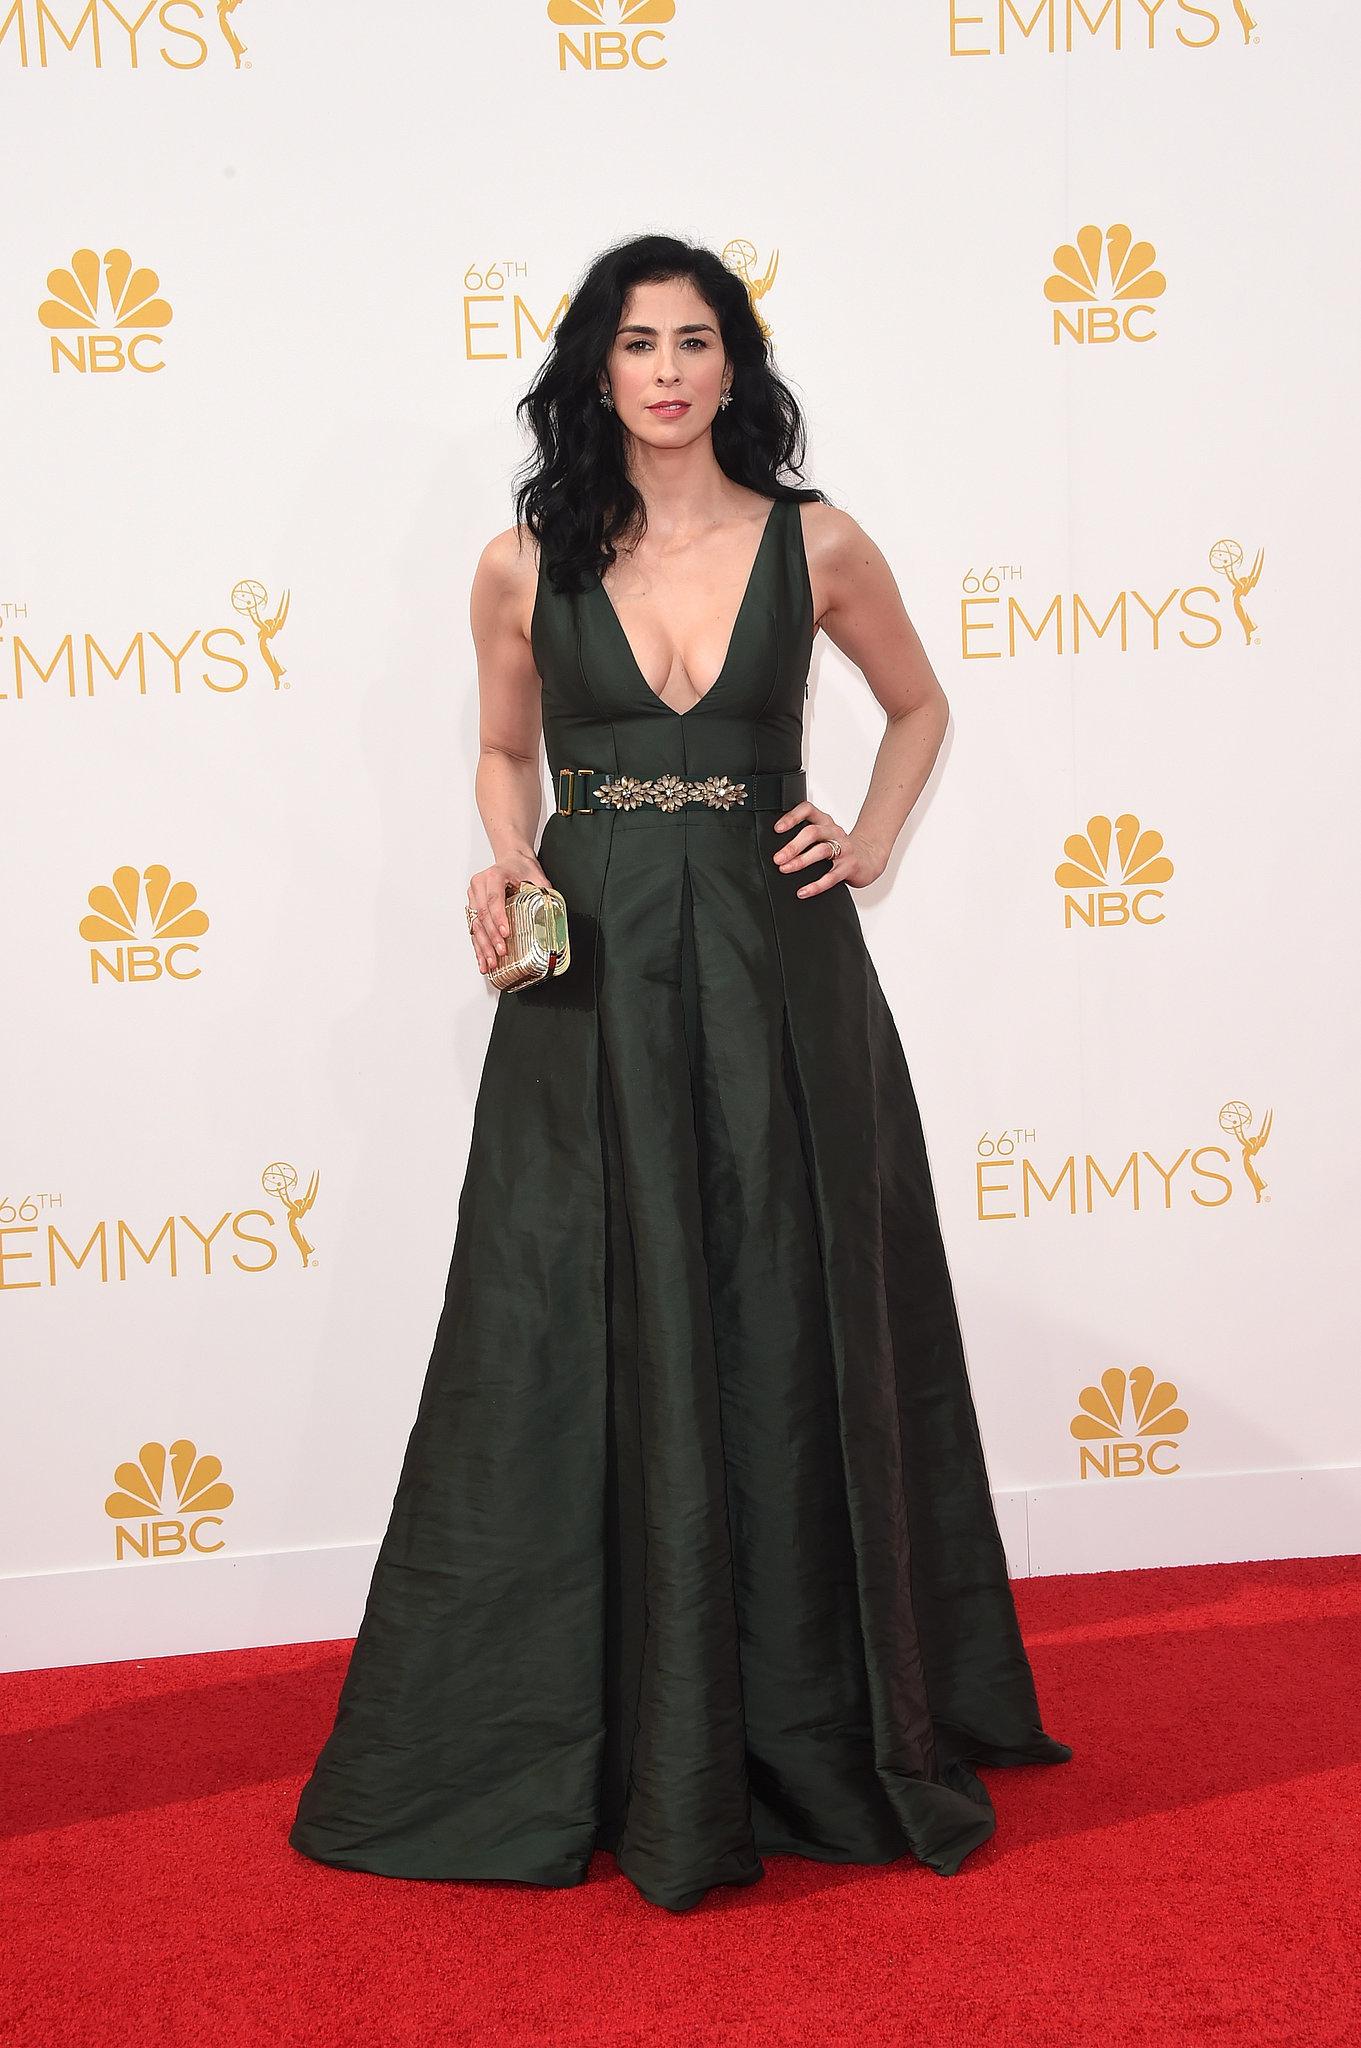 Sarah Silverman at the 2014 Emmy Awards